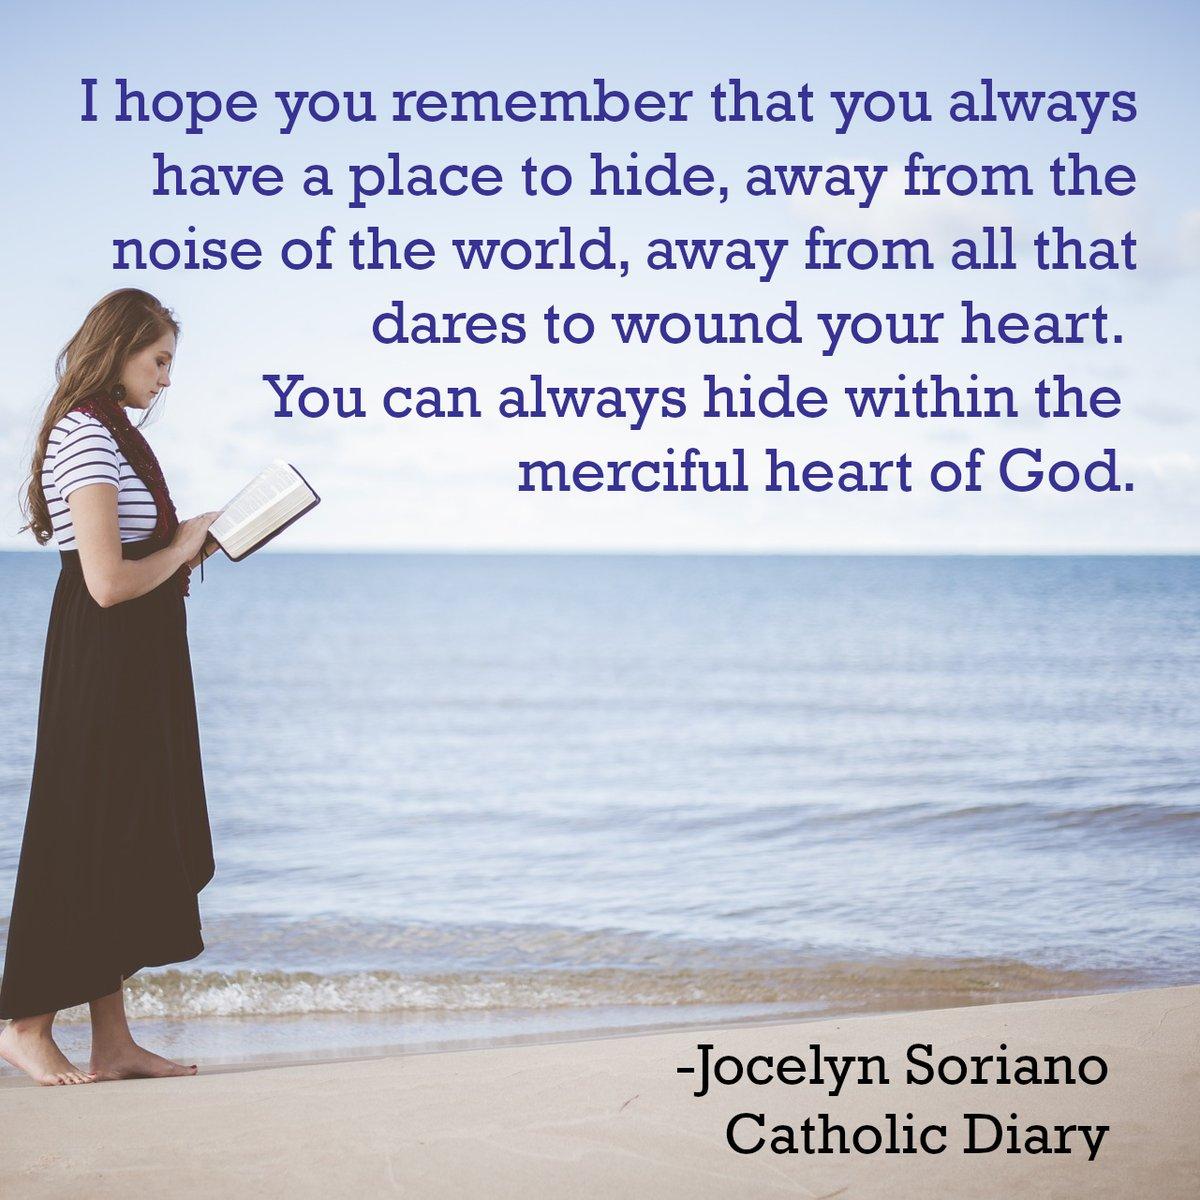 A Time to Hide...   #Christian #Catholic #CatholicTwitter #Devotional #Prayer #WordsOfWisdom #Inspiration #Jesus #blogger #poem #substack